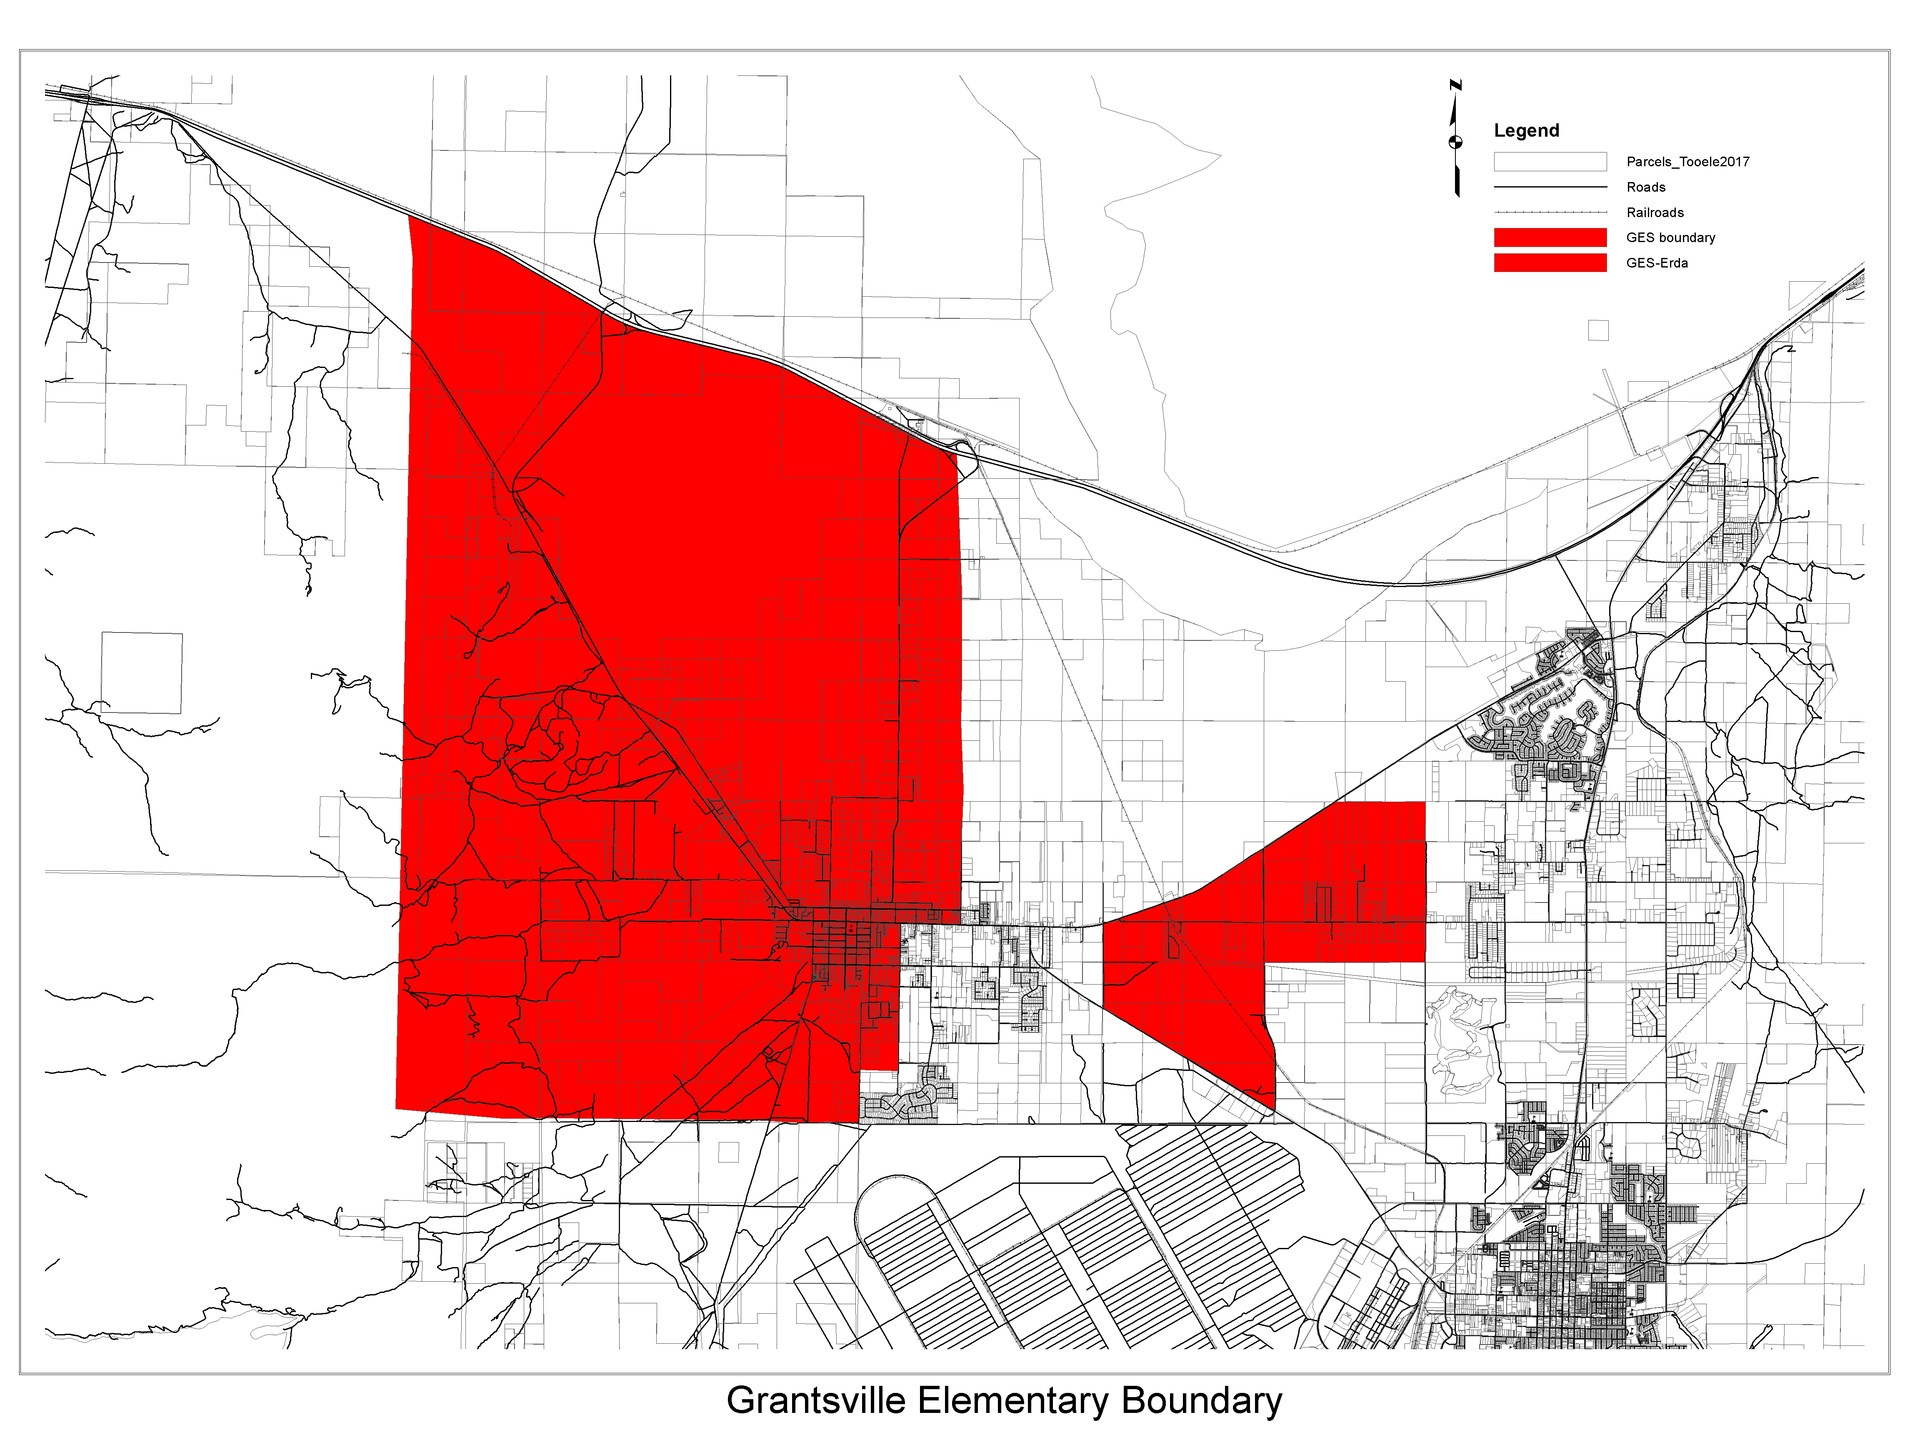 Grantsville Elementary School Boundary